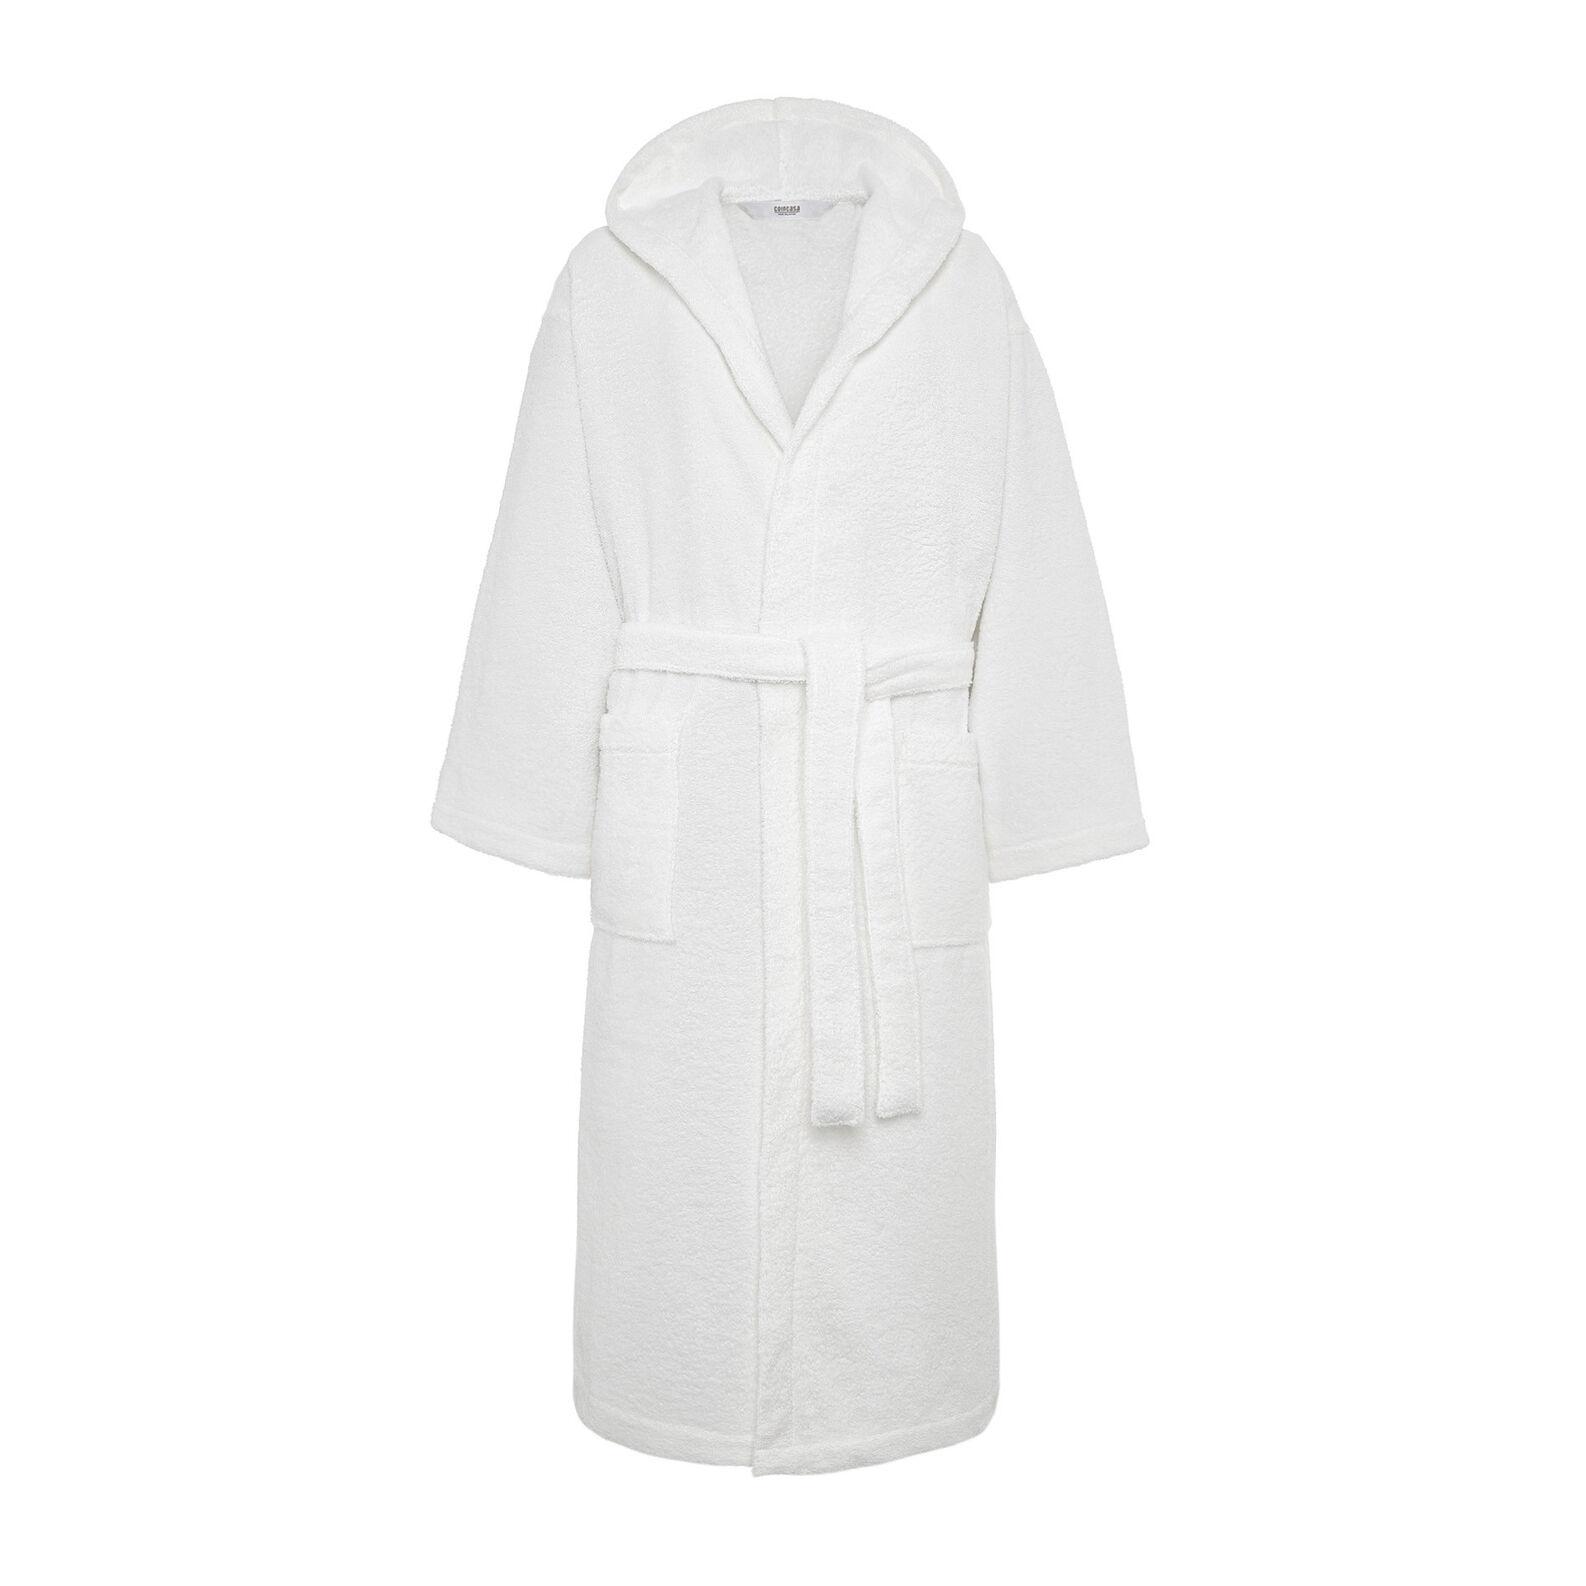 Solid colour 100% Egyptian cotton bathrobe